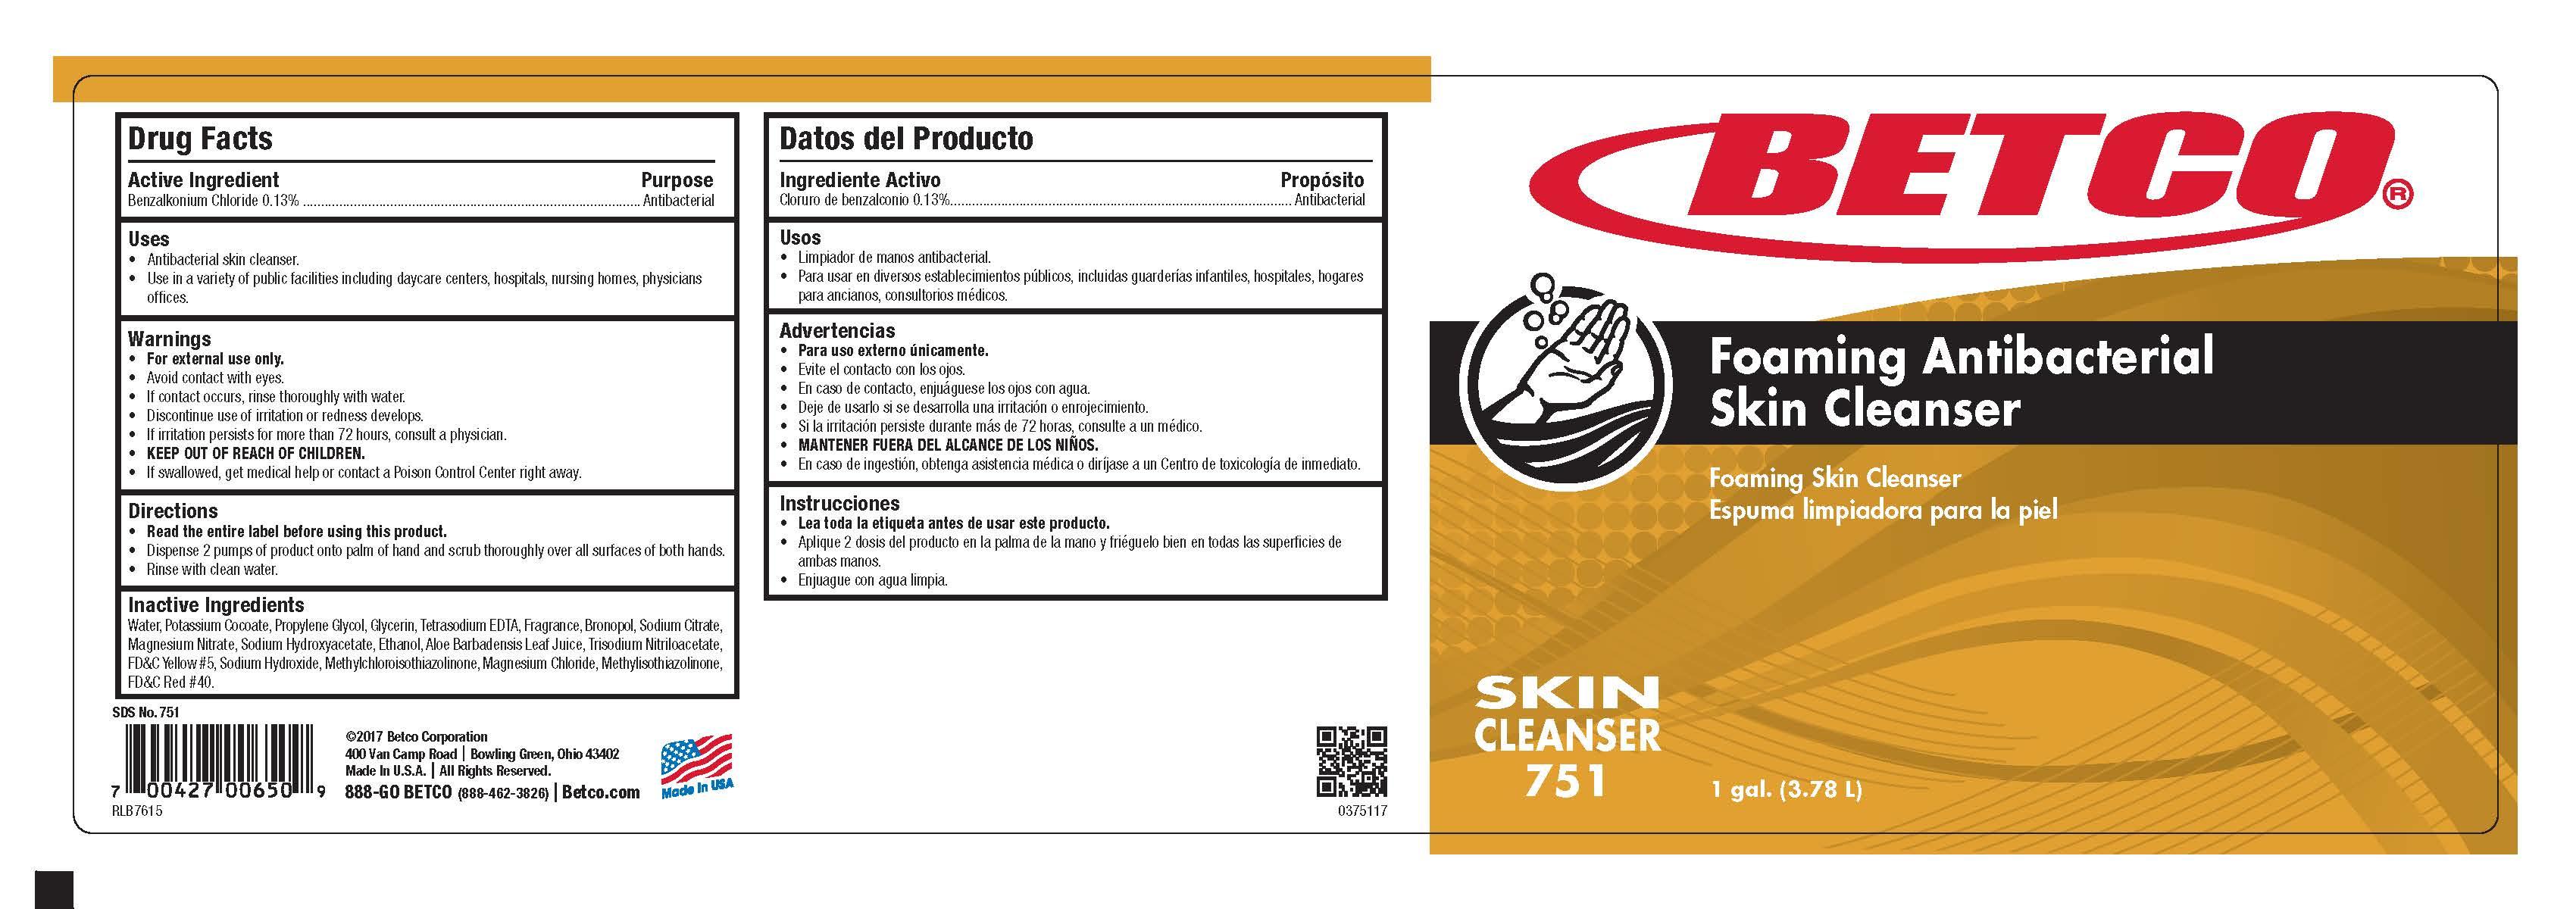 75104-00 Foaming Antibacterial.jpg